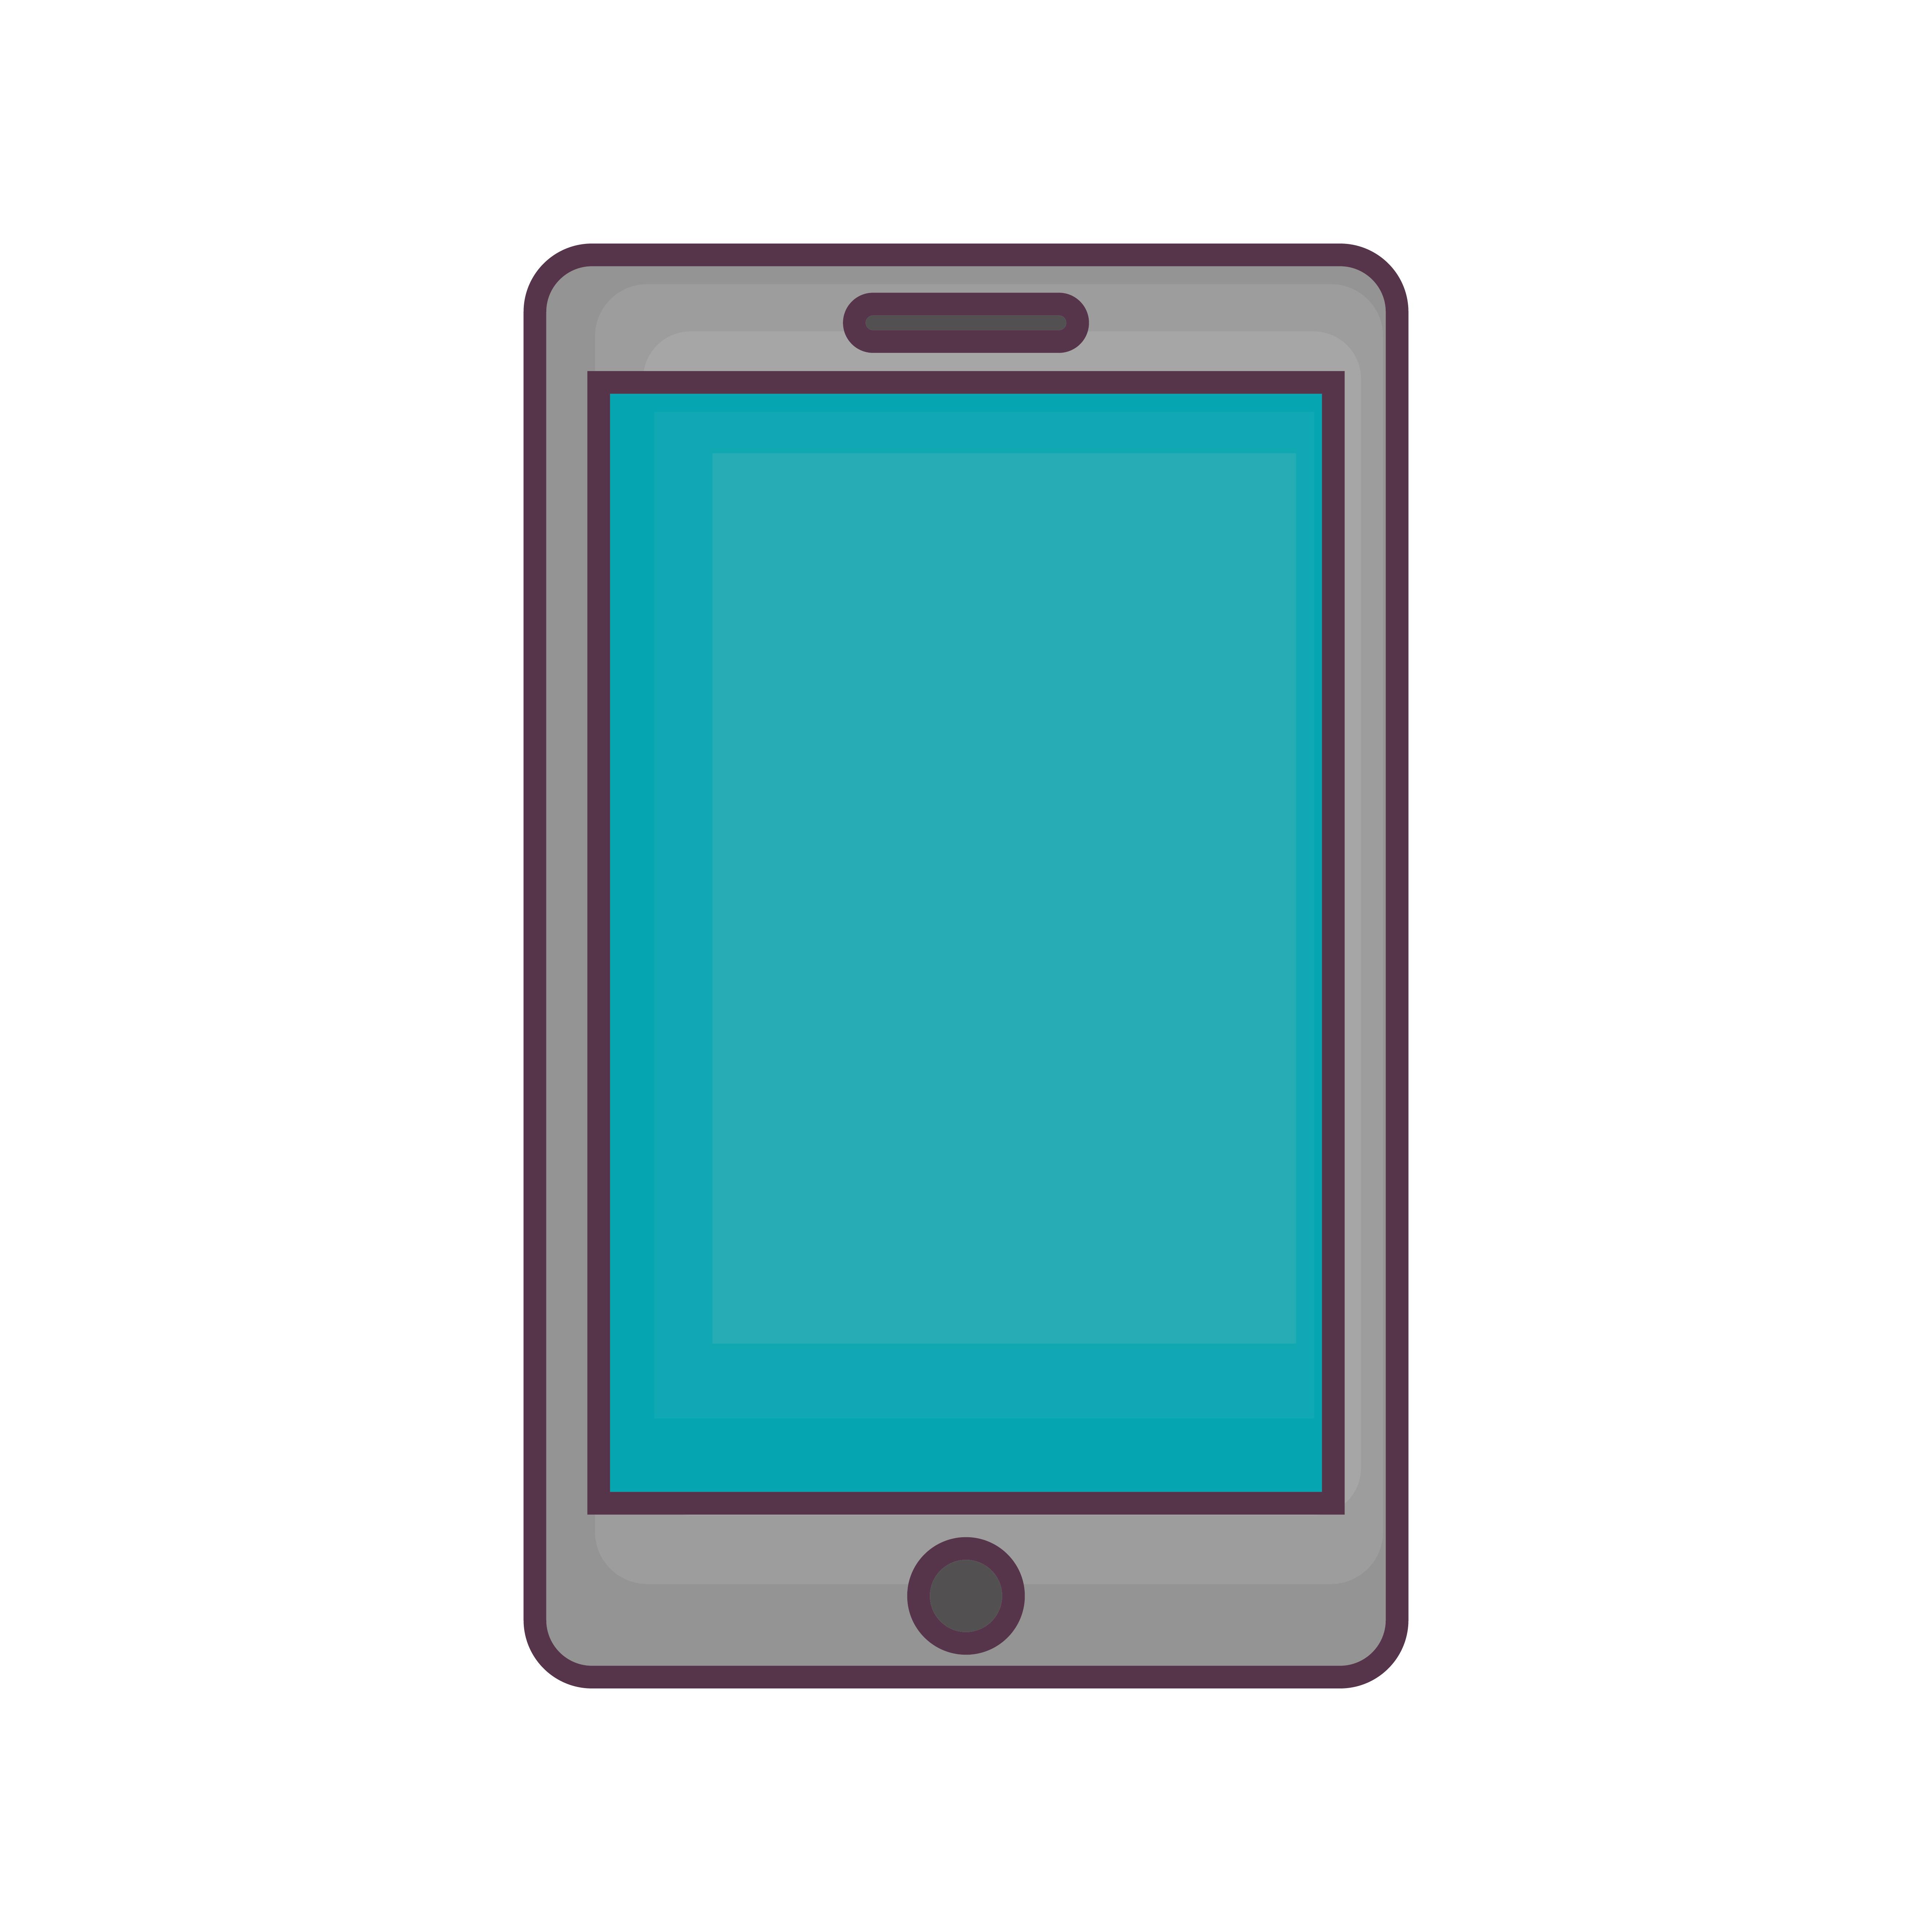 smartphone device icon 654524 - Download Free Vectors ...